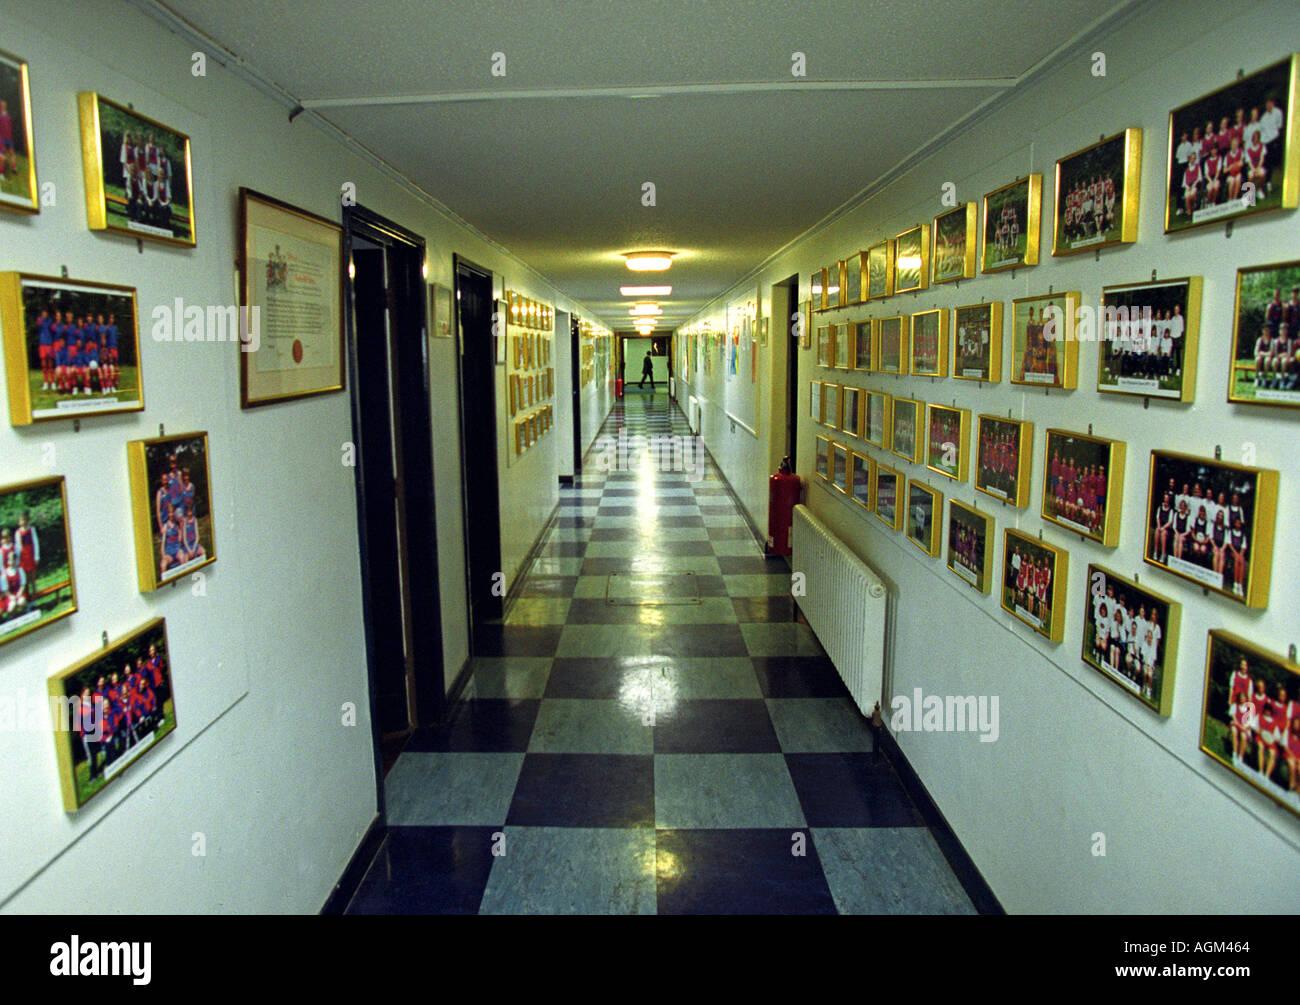 School Corridor Stock Photos  School Corridor Stock